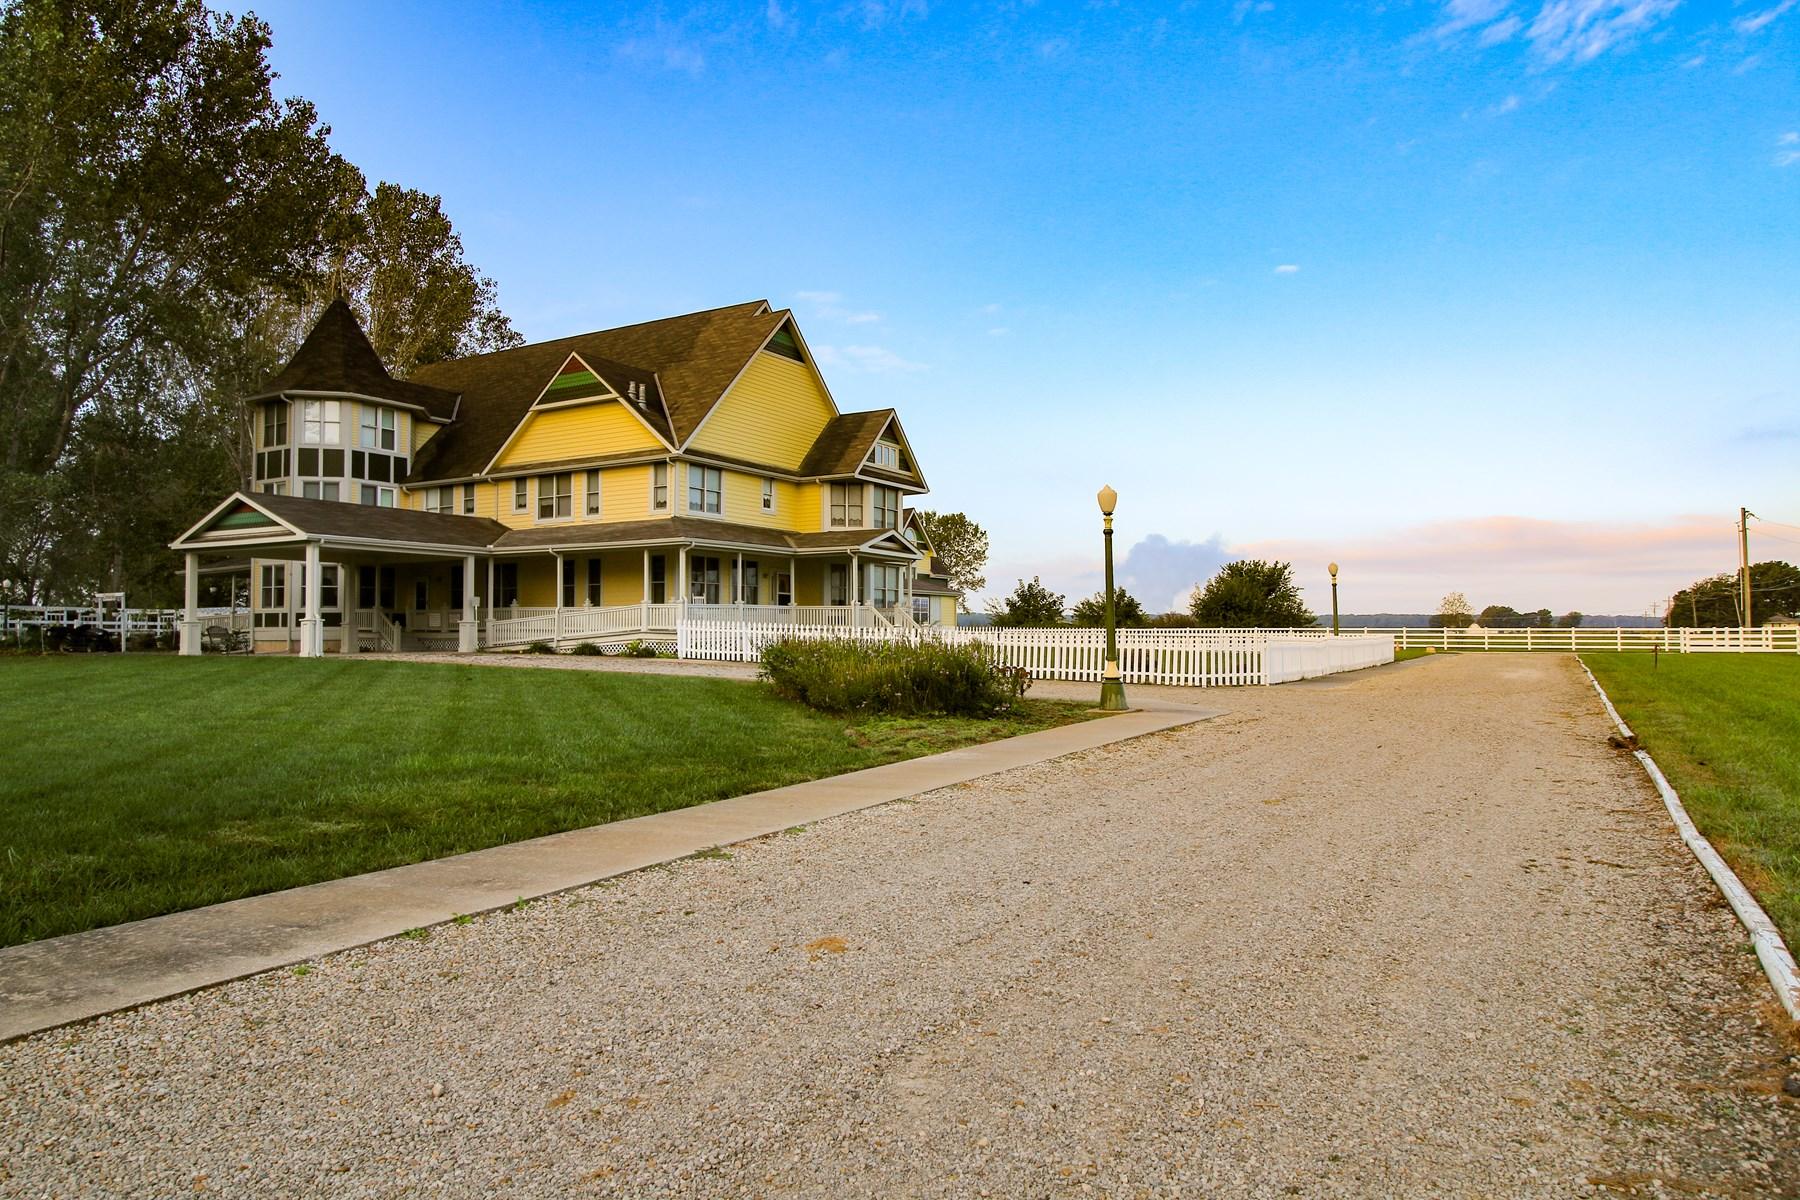 Bed & Breakfast in Lawrence, KS For Sale